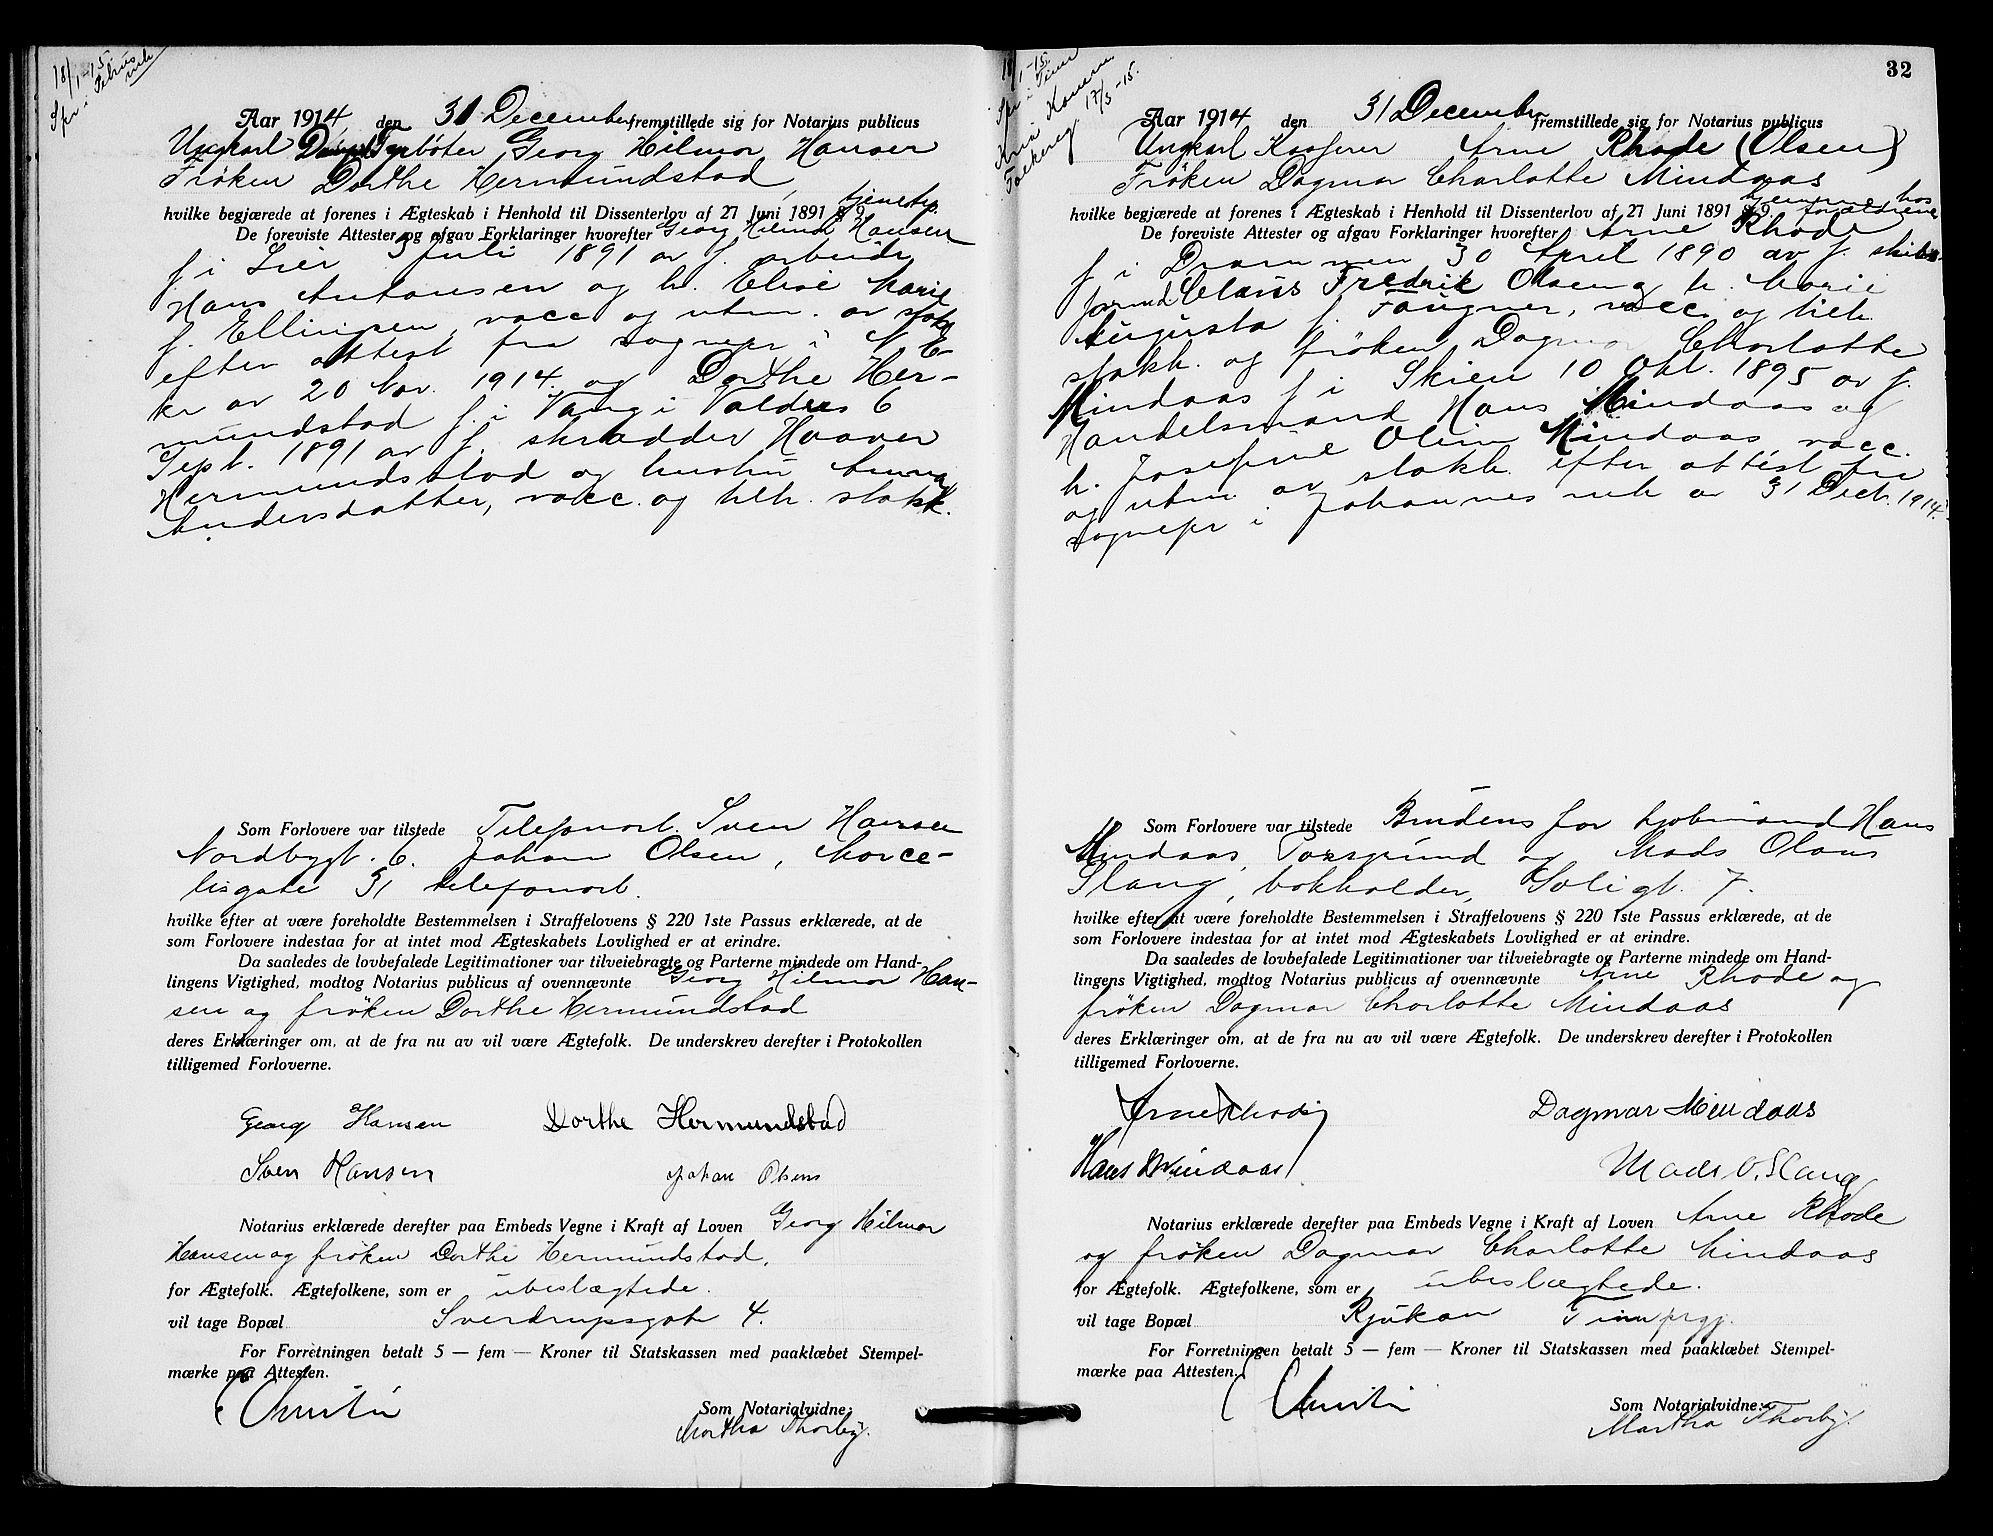 SAO, Oslo byfogd avd. I, L/Lb/Lbb/L0010: Notarialprotokoll, rekke II: Vigsler, 1914-1916, s. 31b-32a